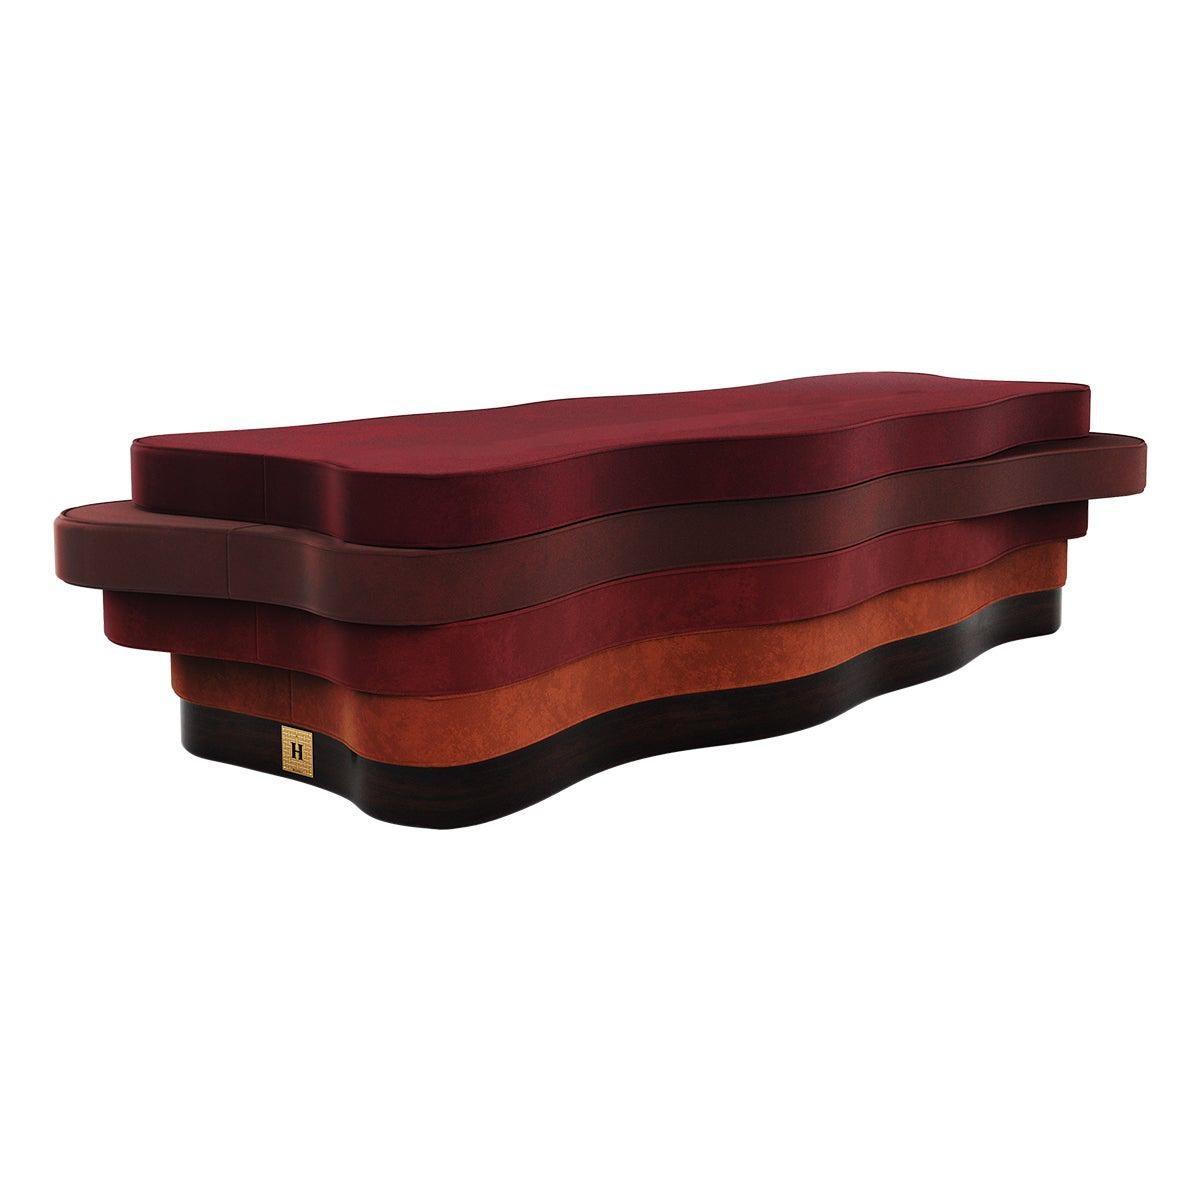 21th Century Contemporary Red Velvet Bench